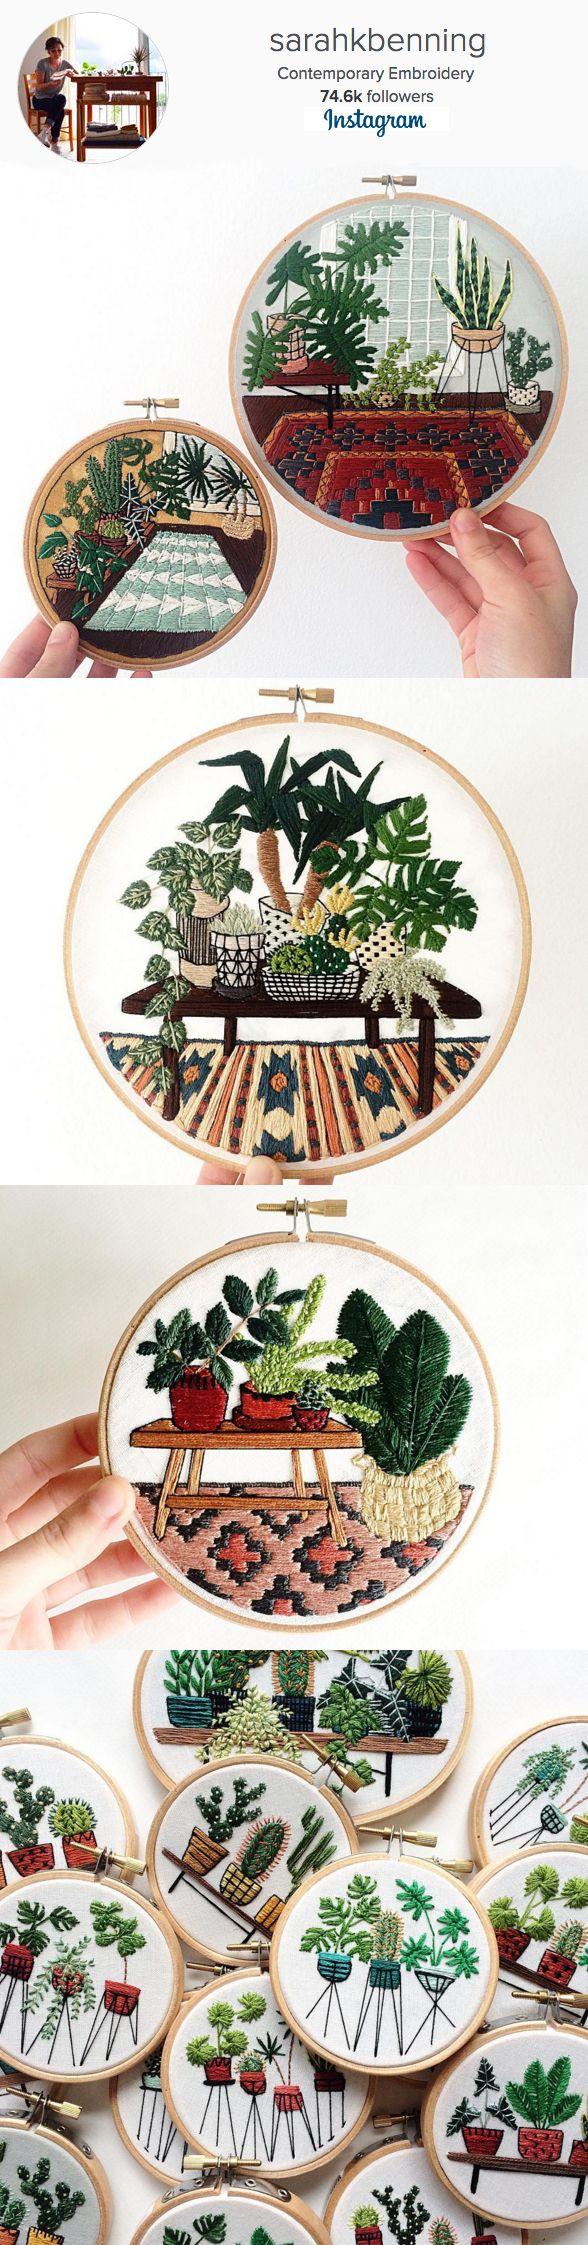 Sarah K Benning, Contemporary Embroidery | Instagram | tutifruti ...